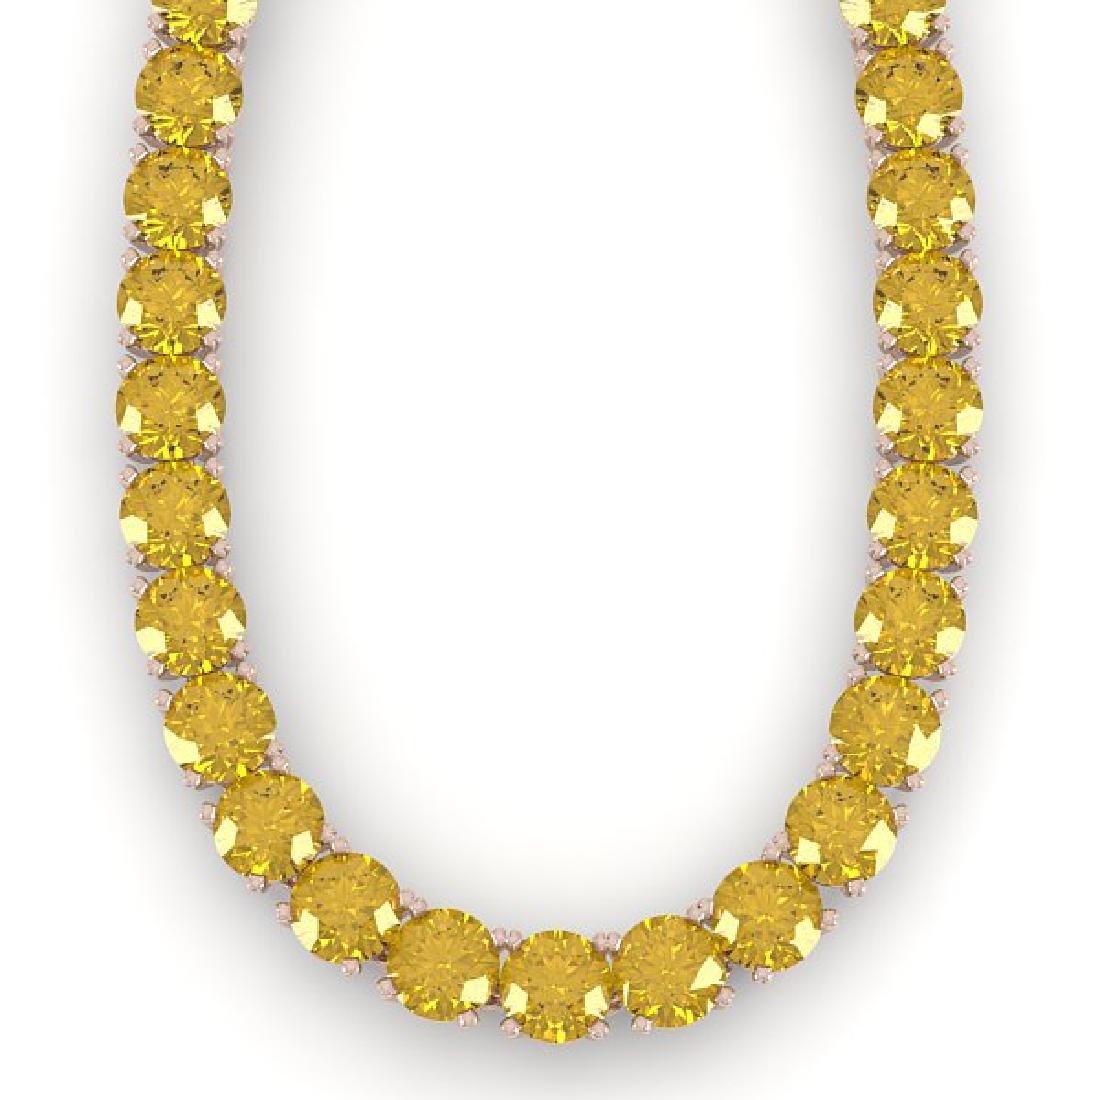 30 CTW Certified Fancy Yellow SI Diamond Necklace 14K - 2